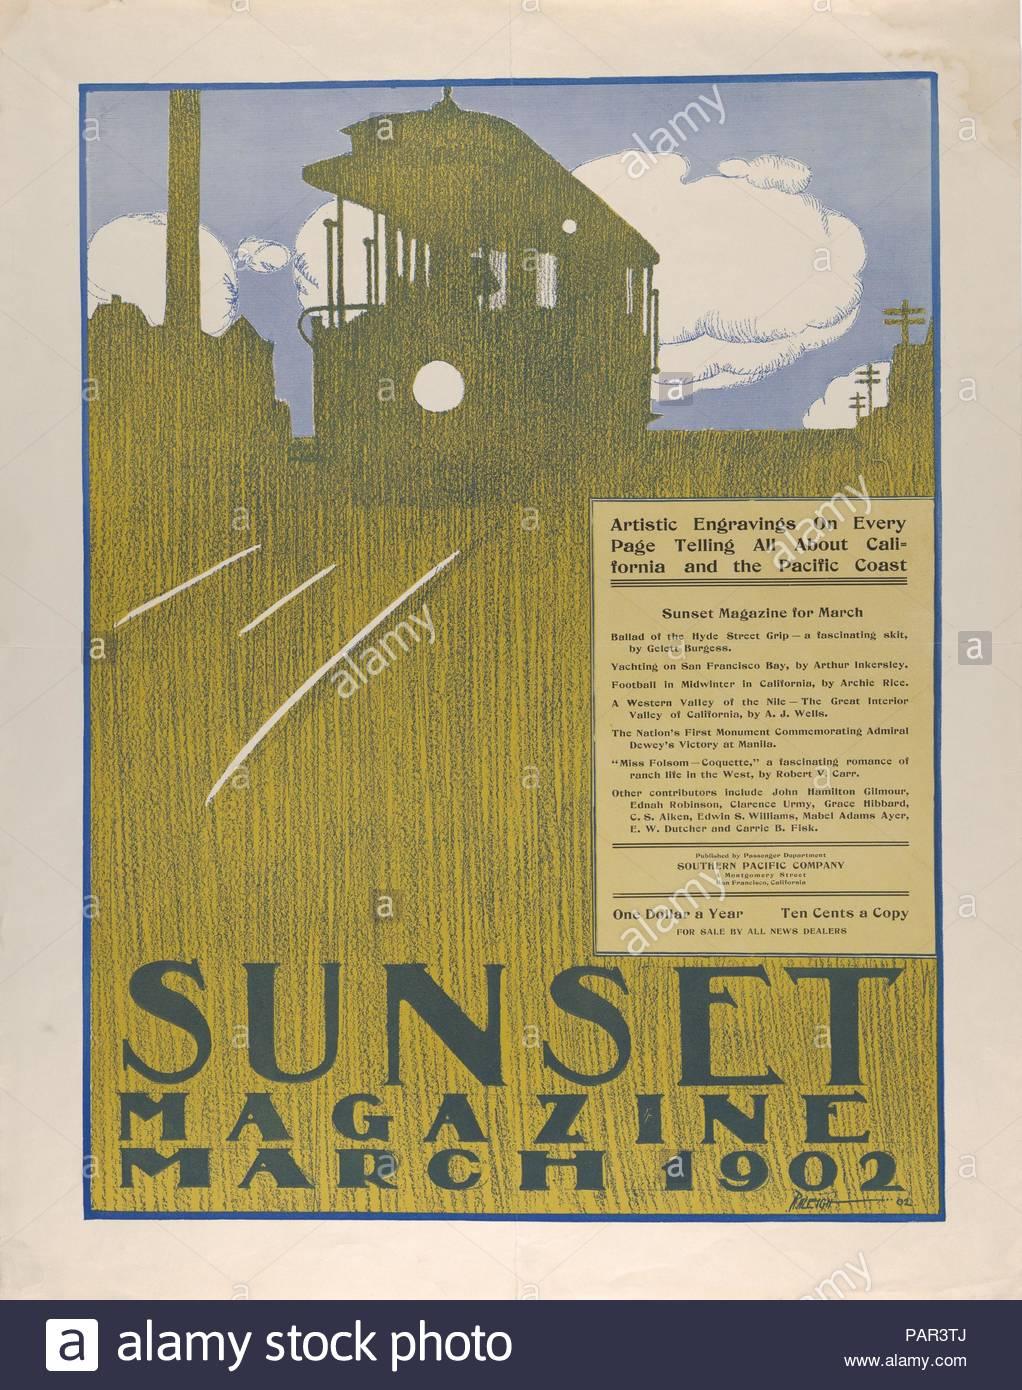 Sunset Magazine: March. Artist: Henry Patrick Raleigh (American, Portland, Oregon 1880-1944 New York). Dimensions: Sheet: 24 × 19 in. (61 × 48.3 cm). Date: 1902. Museum: Metropolitan Museum of Art, New York, USA. - Stock Image